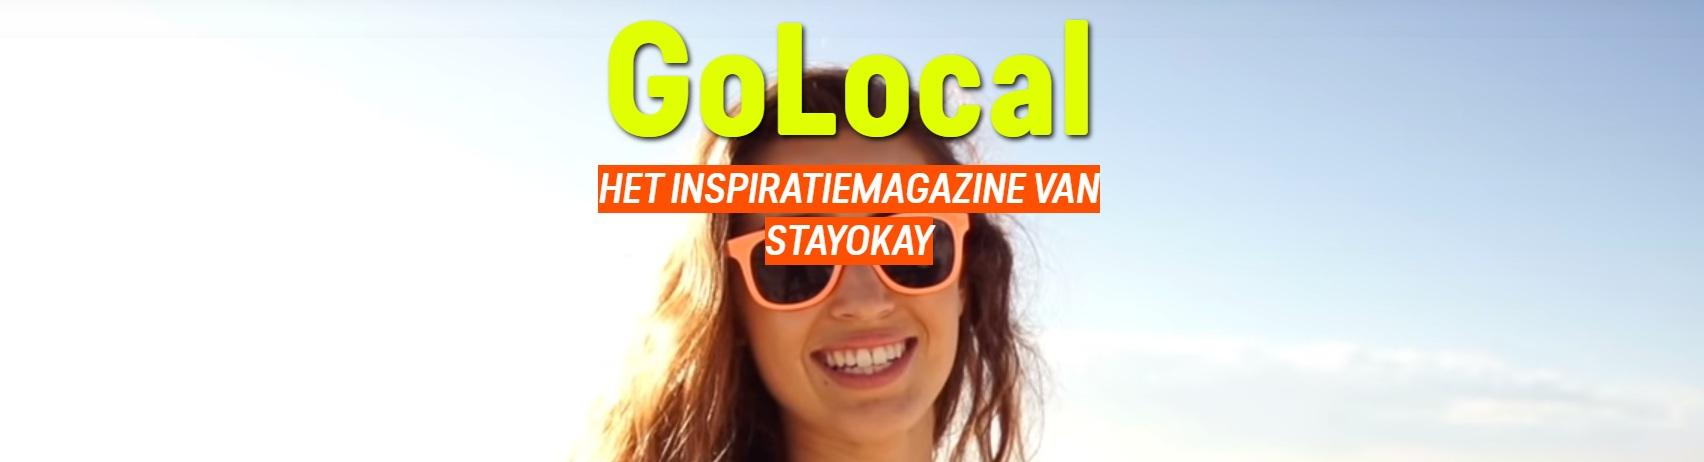 Golocal2.jpg